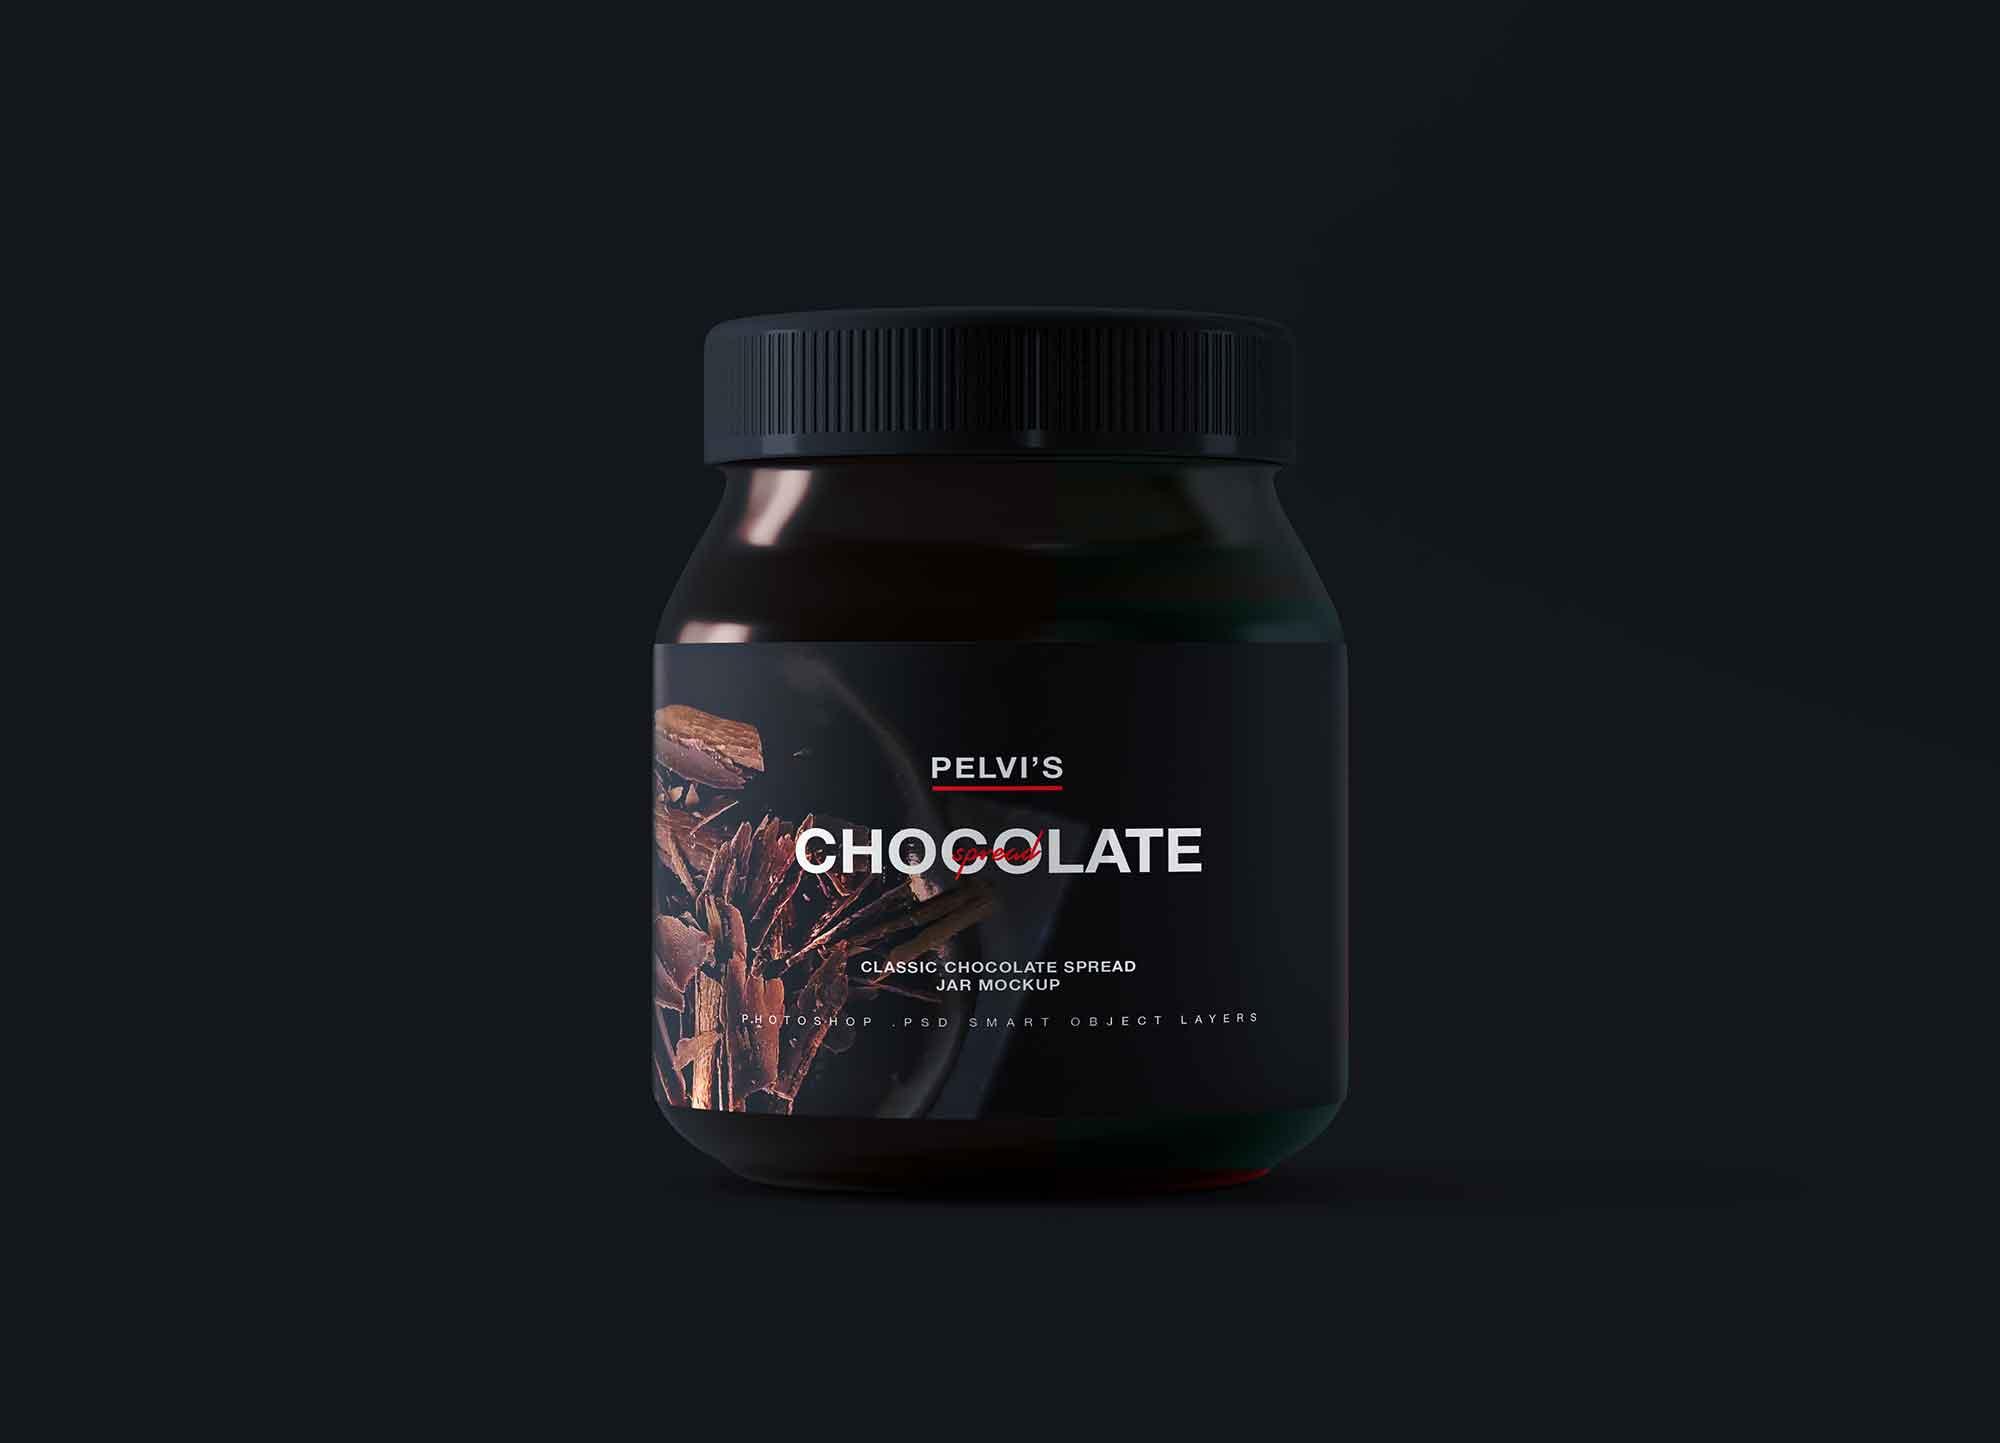 Free Glass Chocolate Jar Mockup